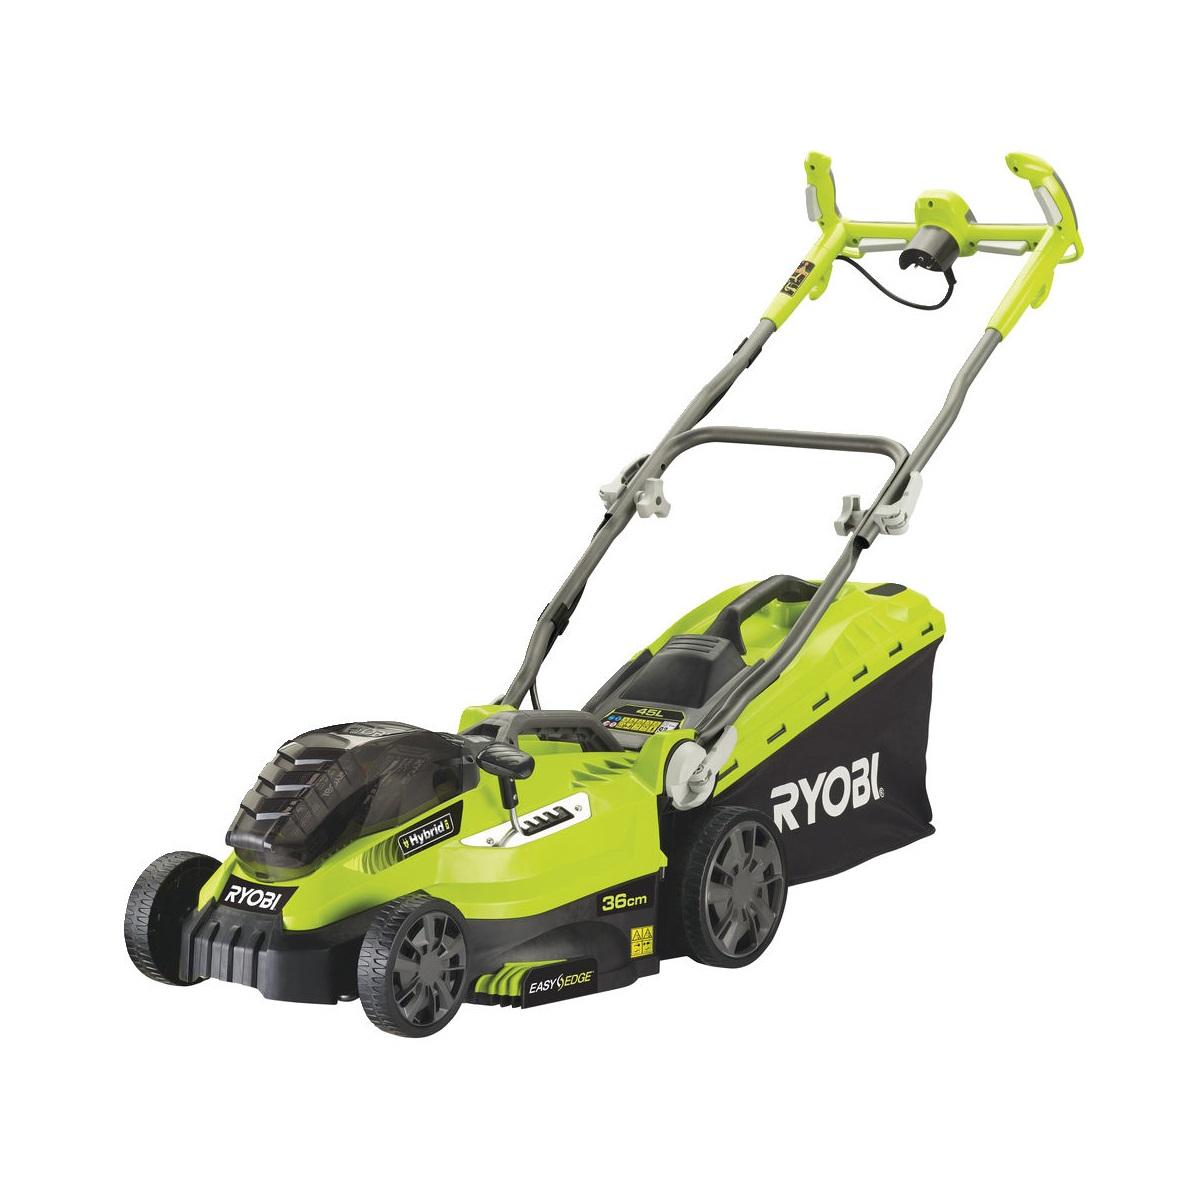 Ryobi RLM18X36-H250F